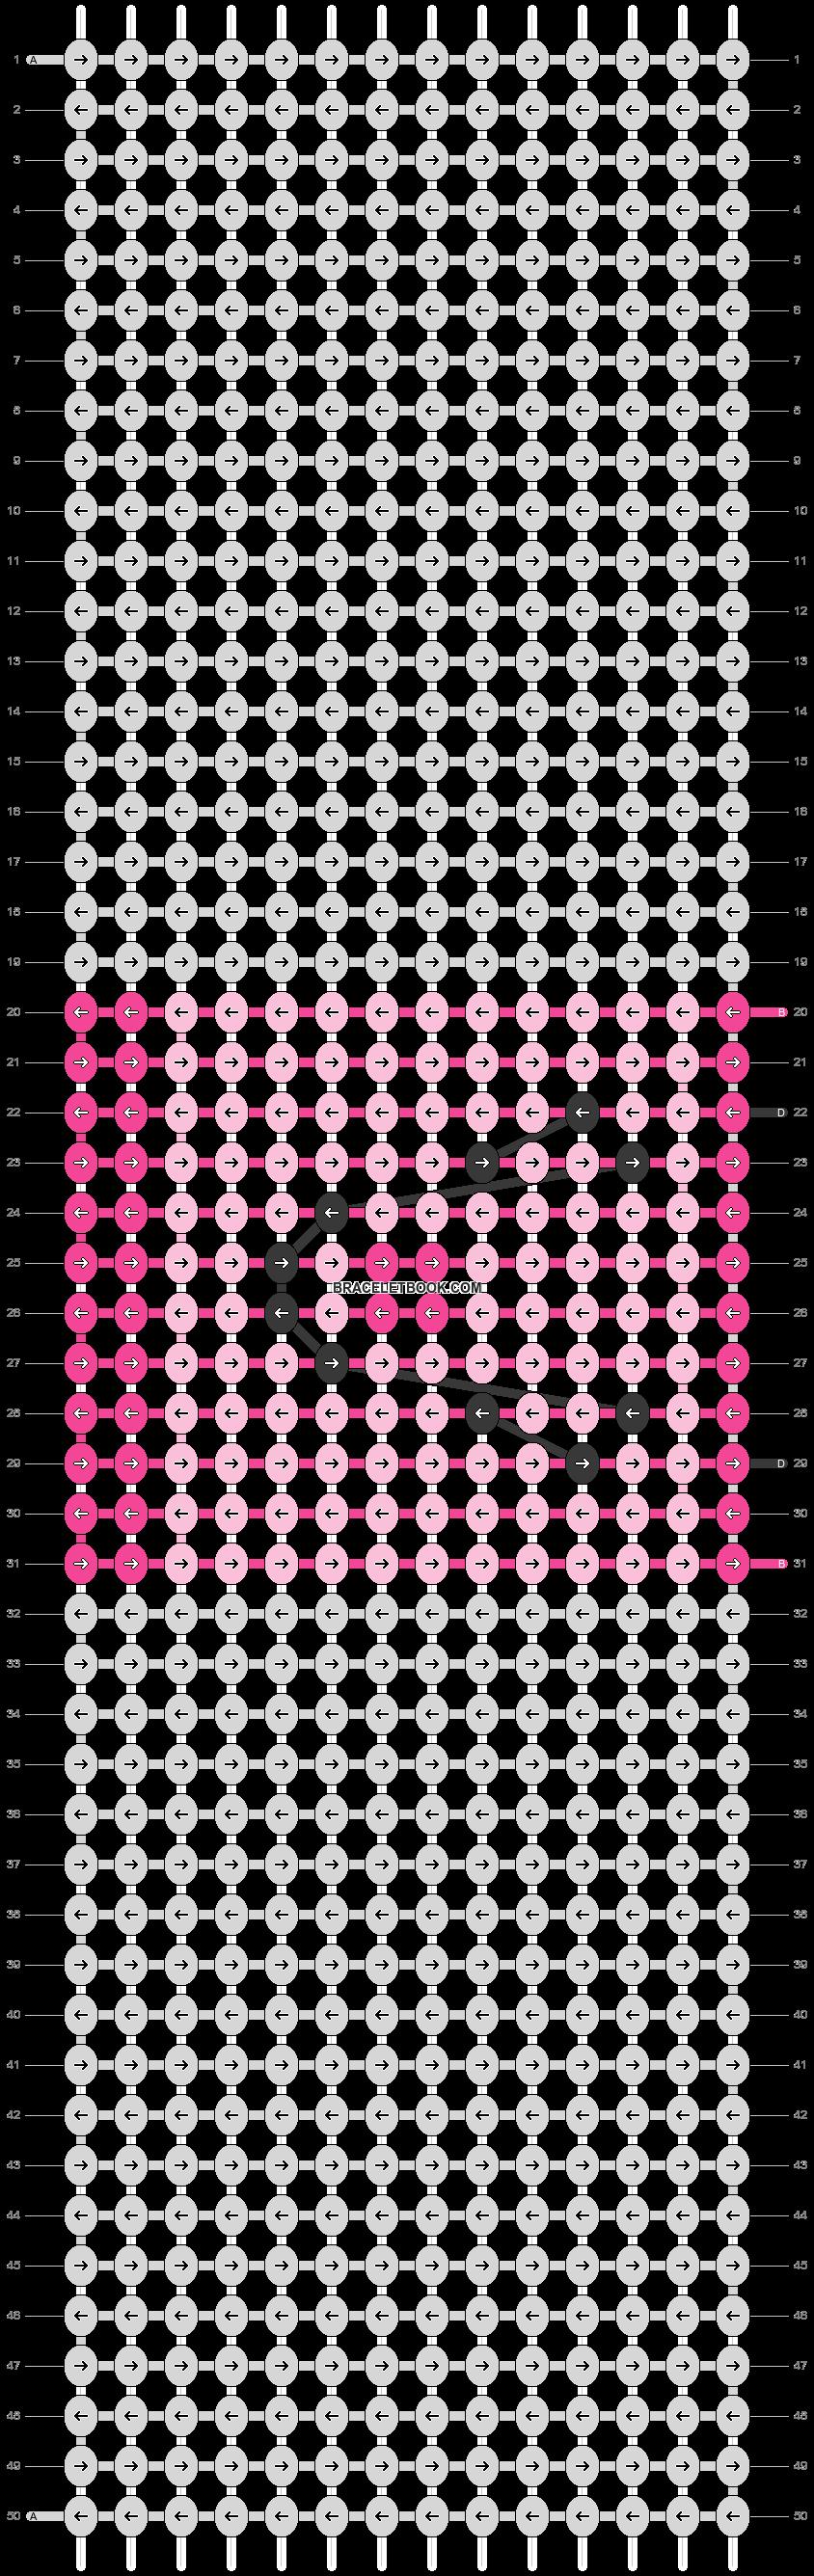 Alpha pattern #19069 pattern